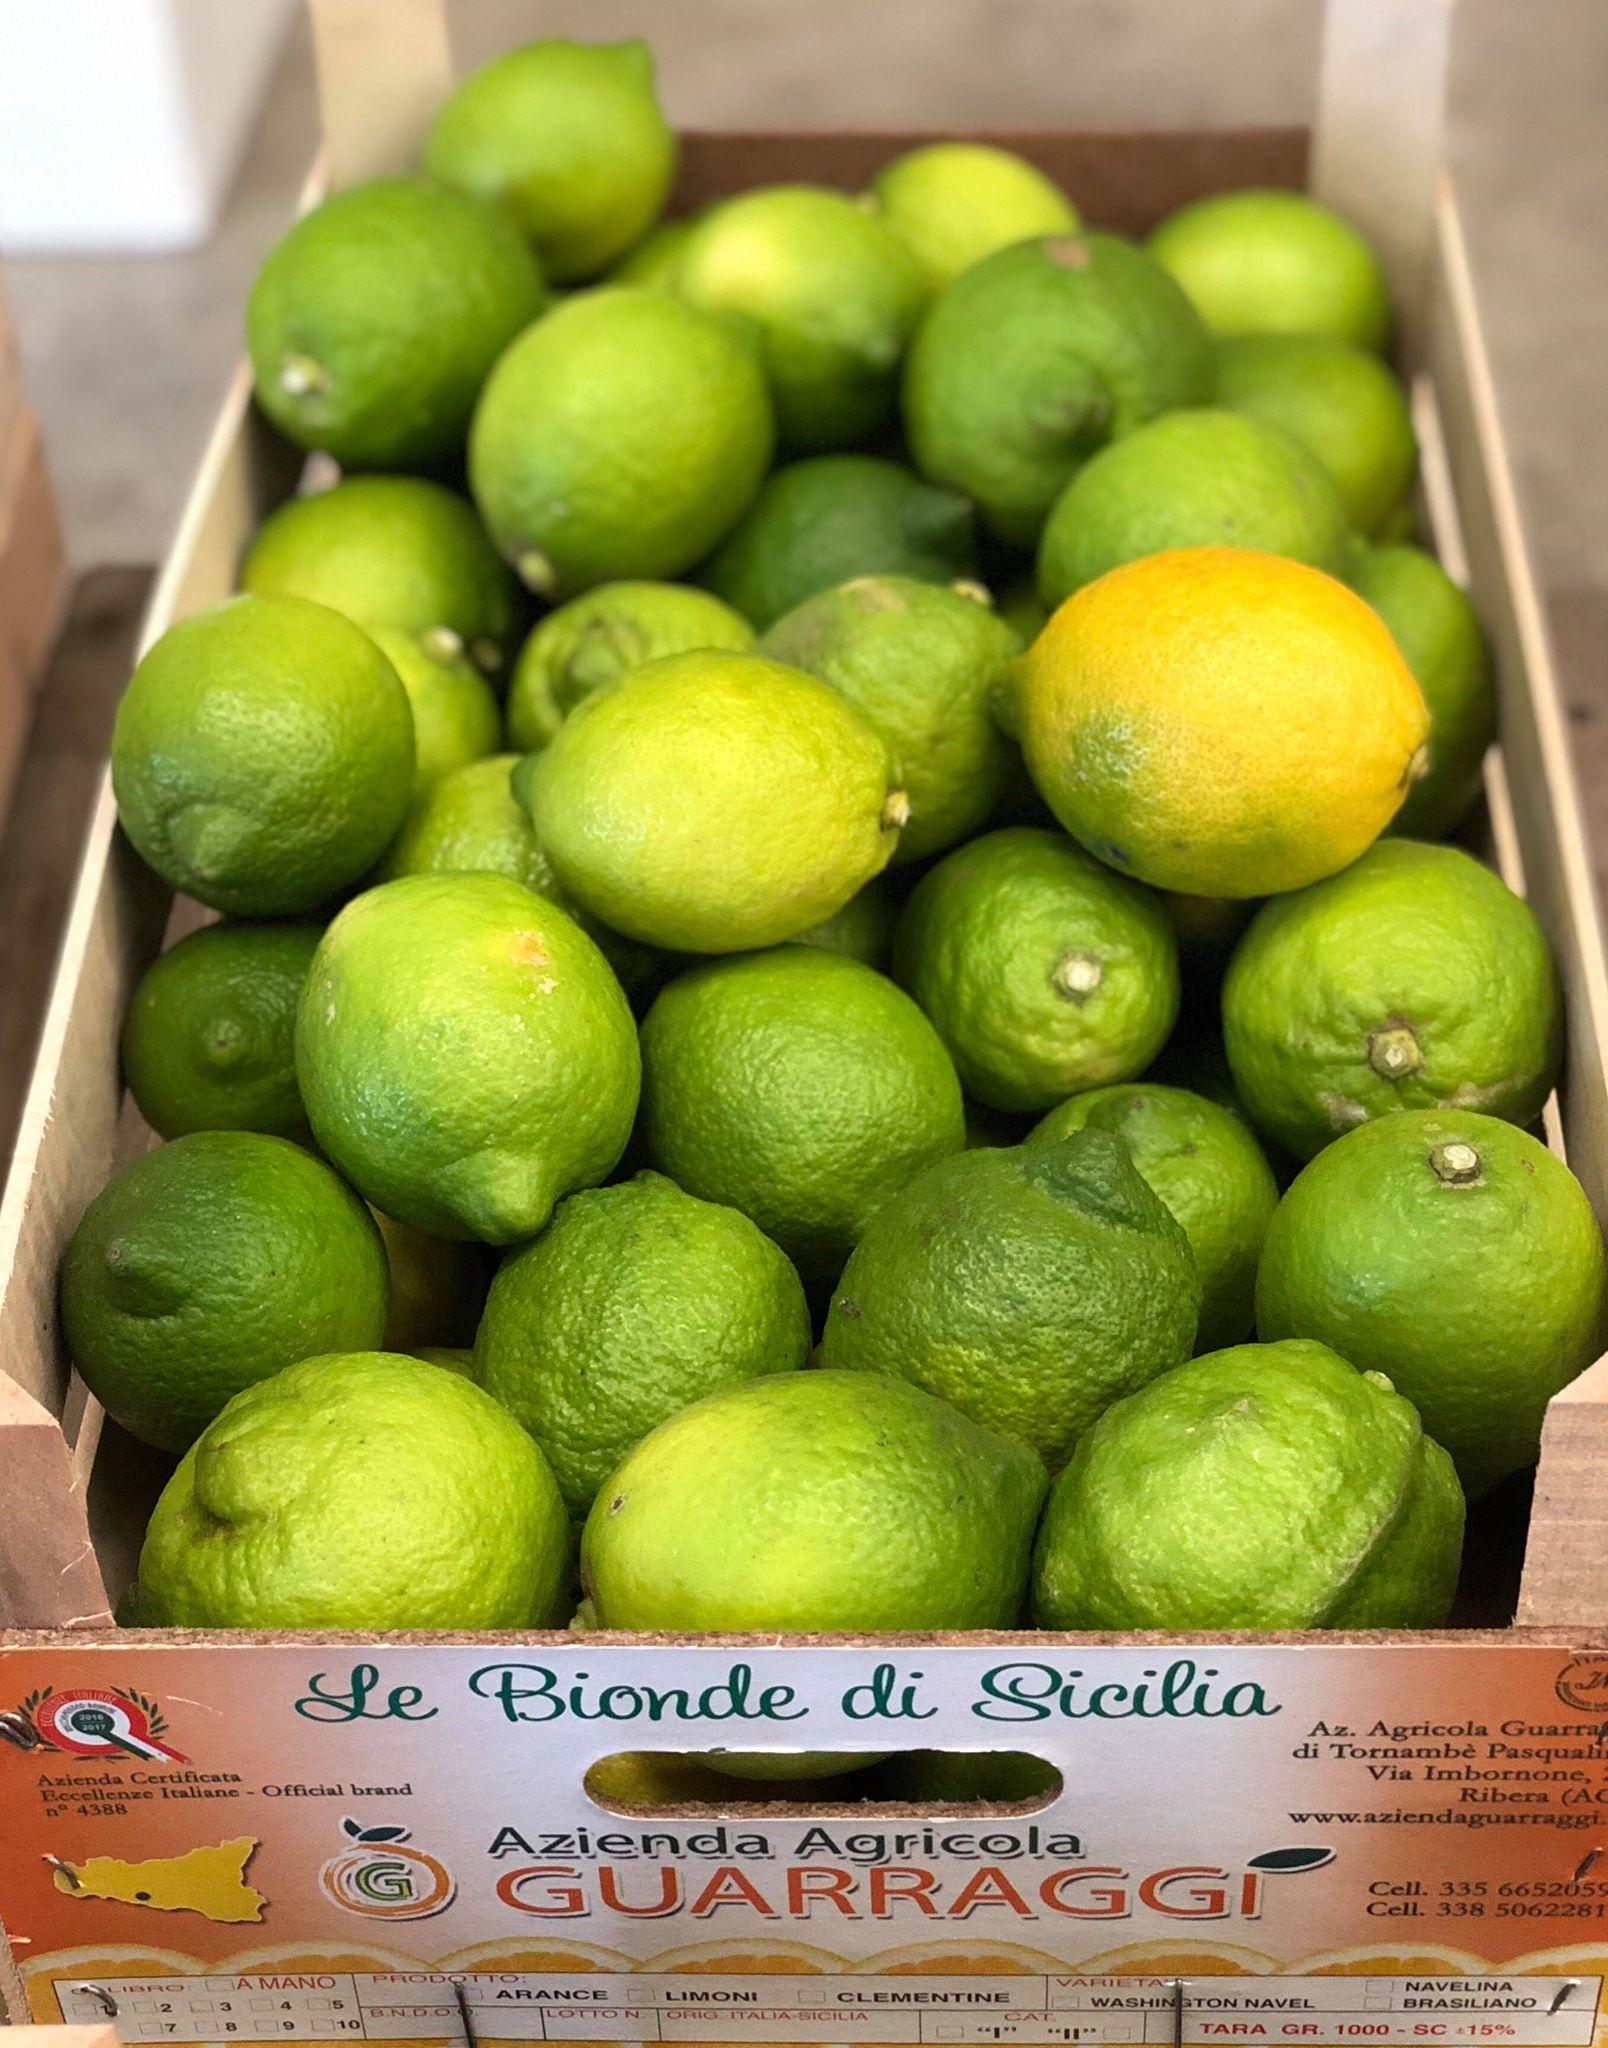 Sicilian lemons from Ribera